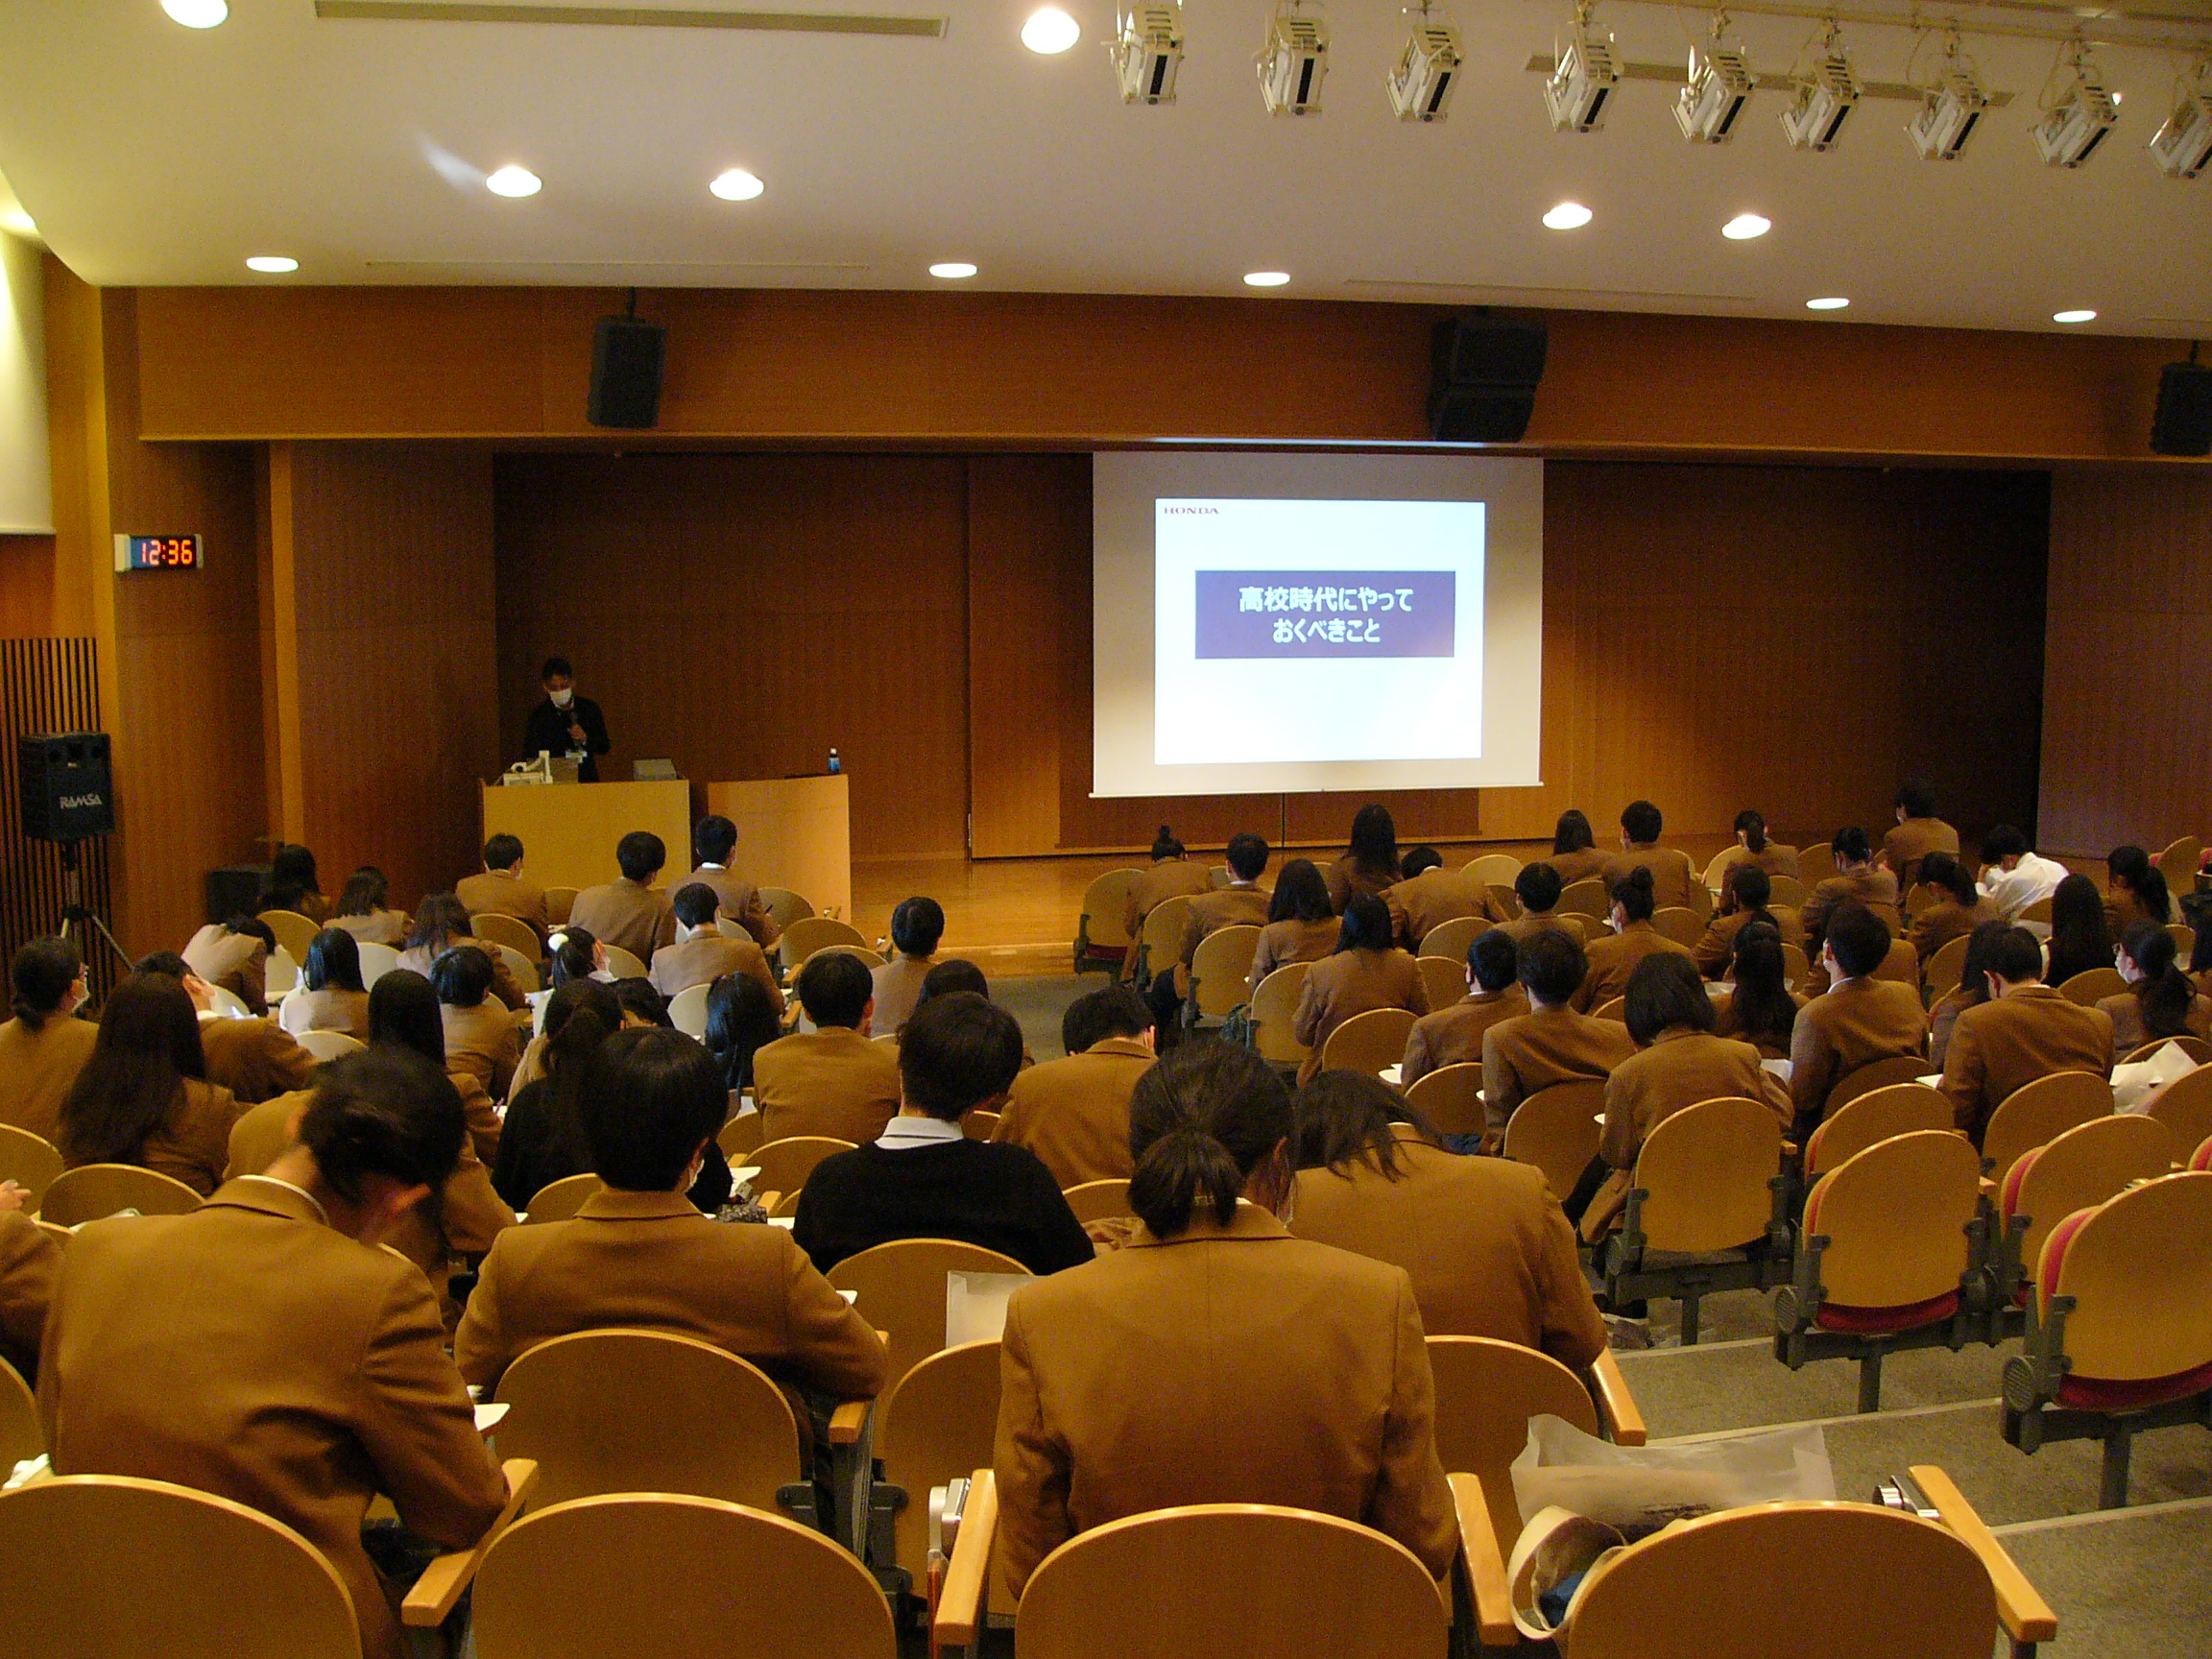 【出前授業】大阪緑涼高校での進路探究授業